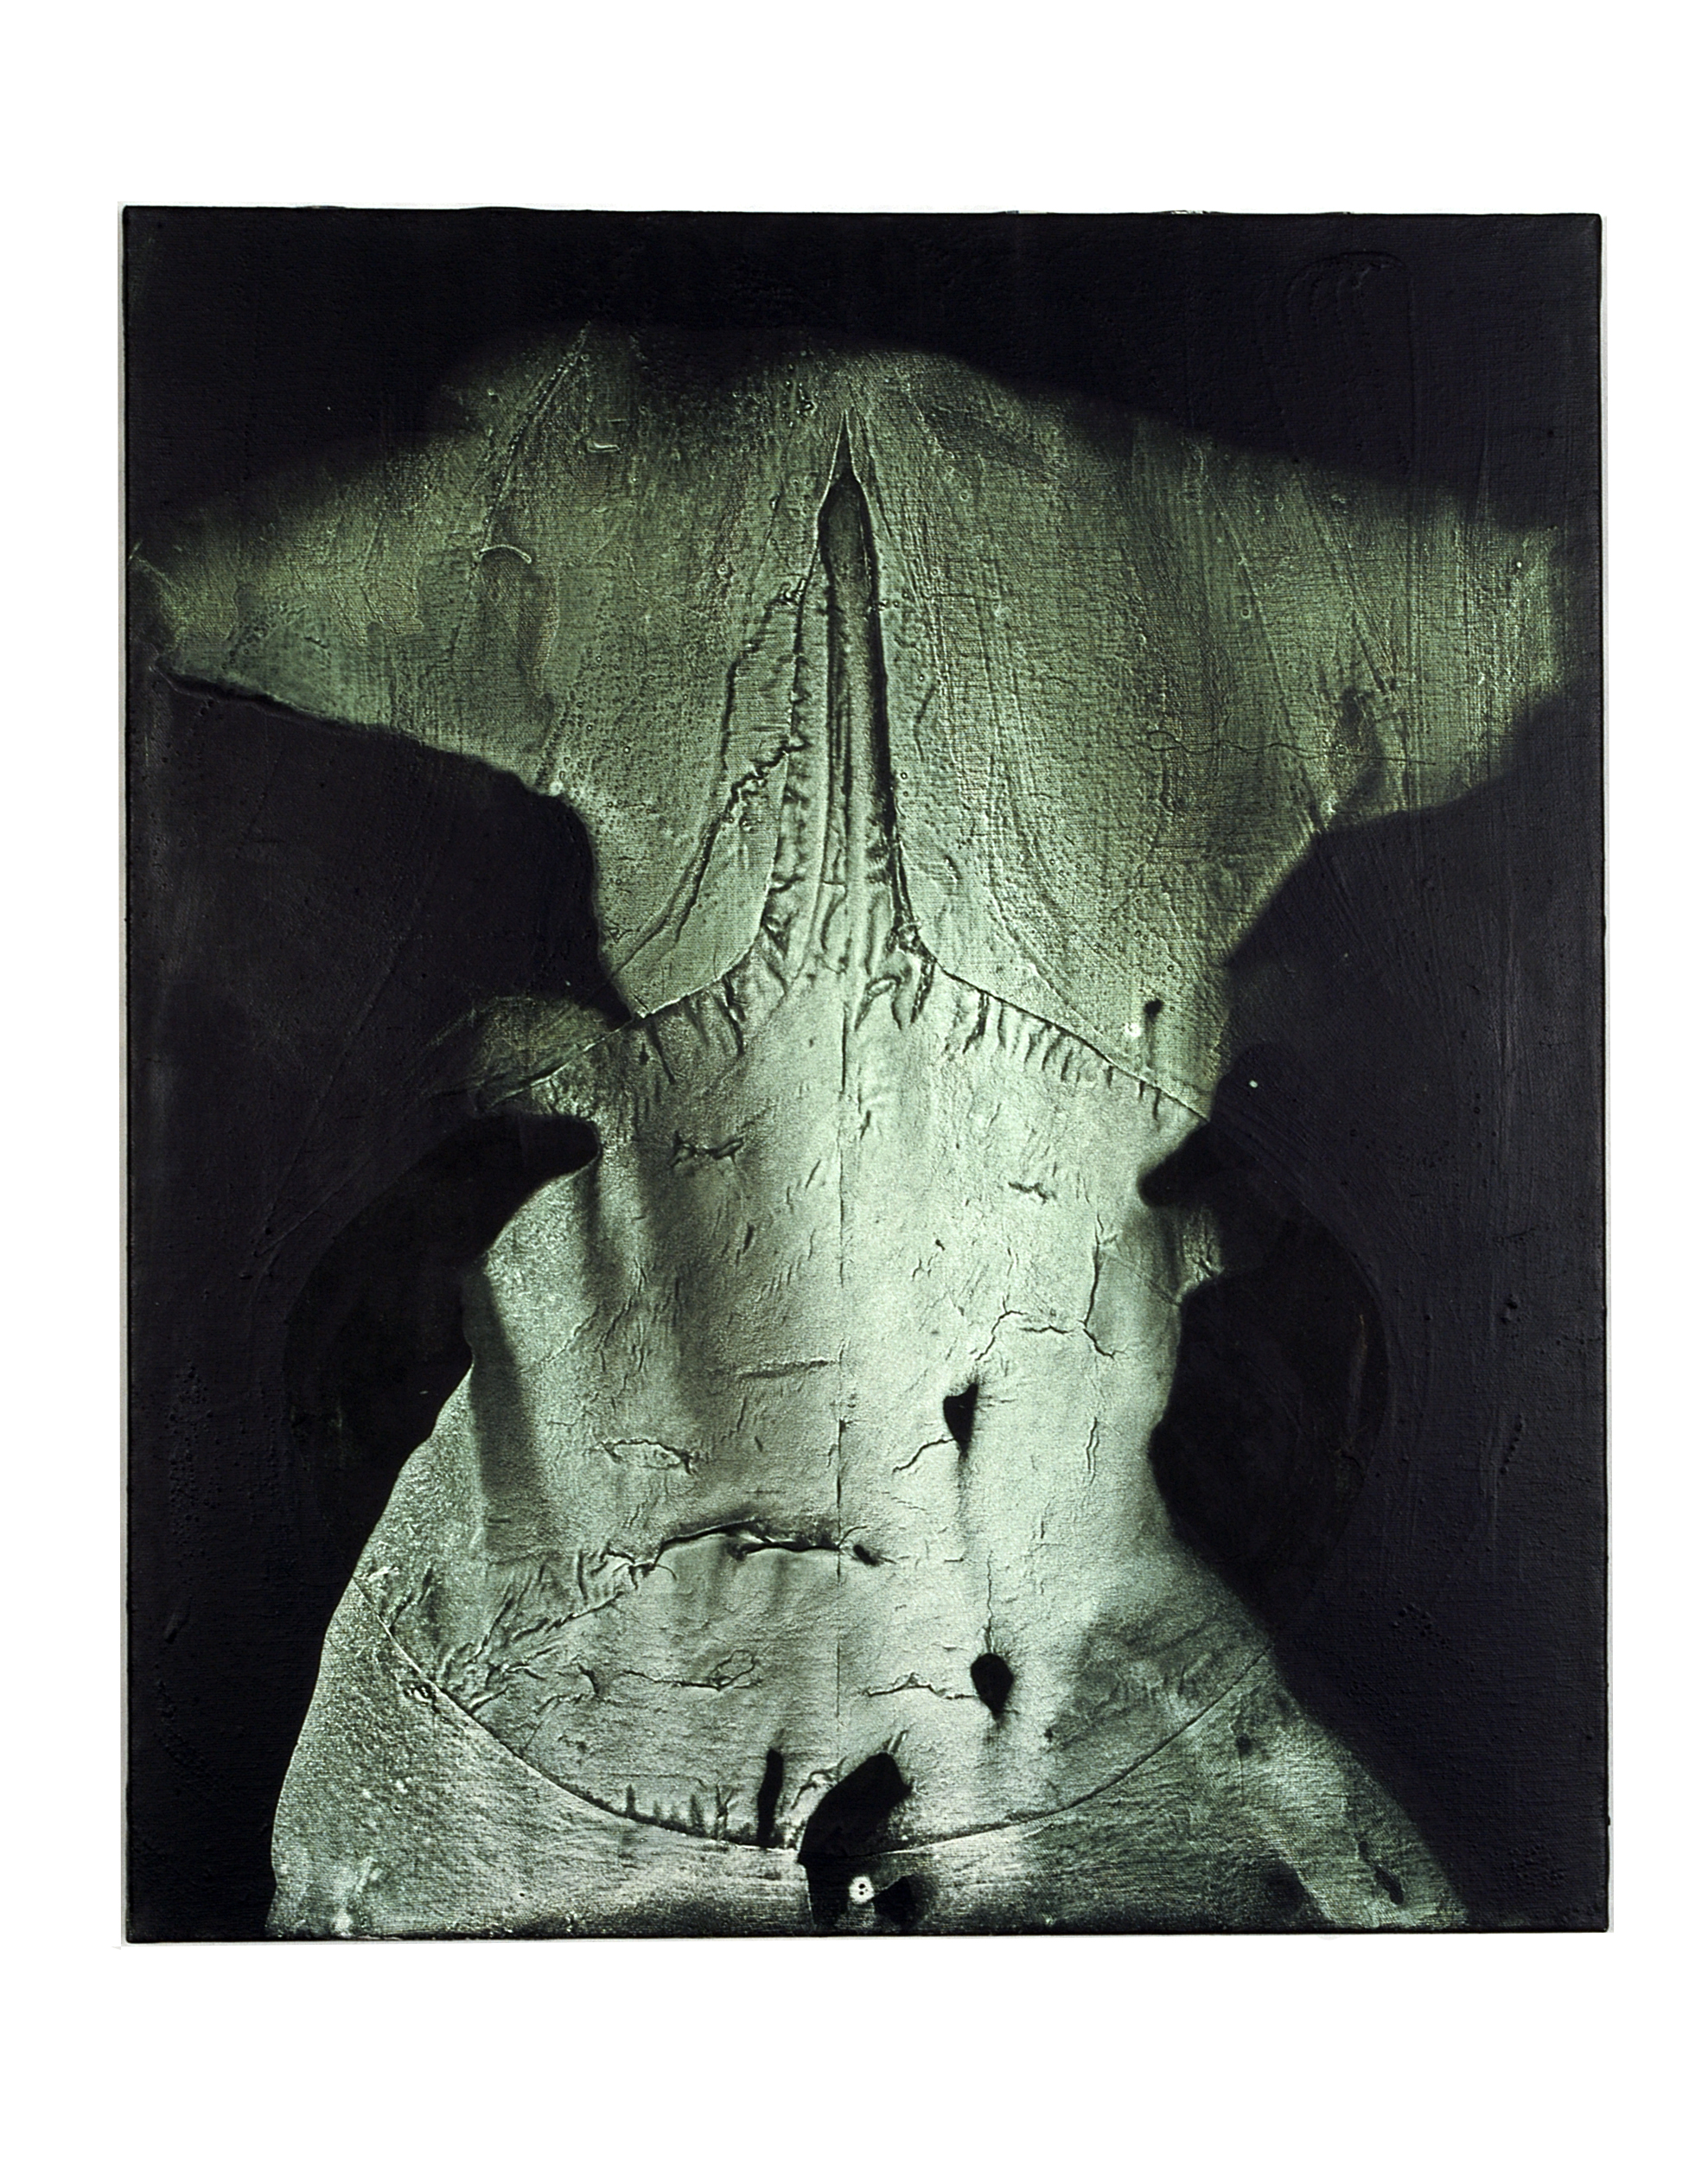 SoHyun Bae, Solitude Quietude Beatitude, 2004, acrylic on canvas, 80 x 60 cm